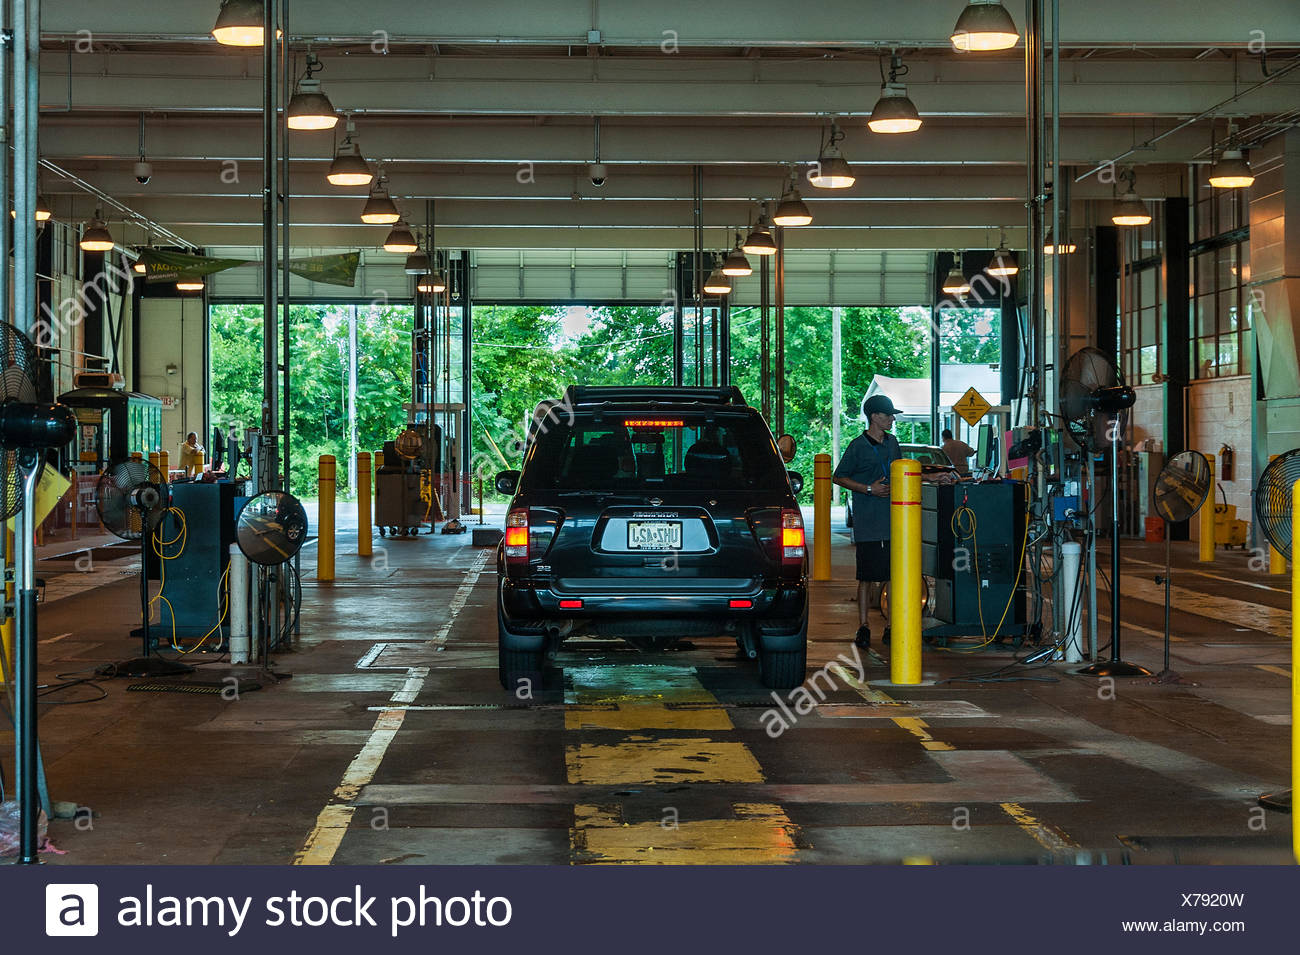 State auto inspection station, New Jersey, USA Stock Photo